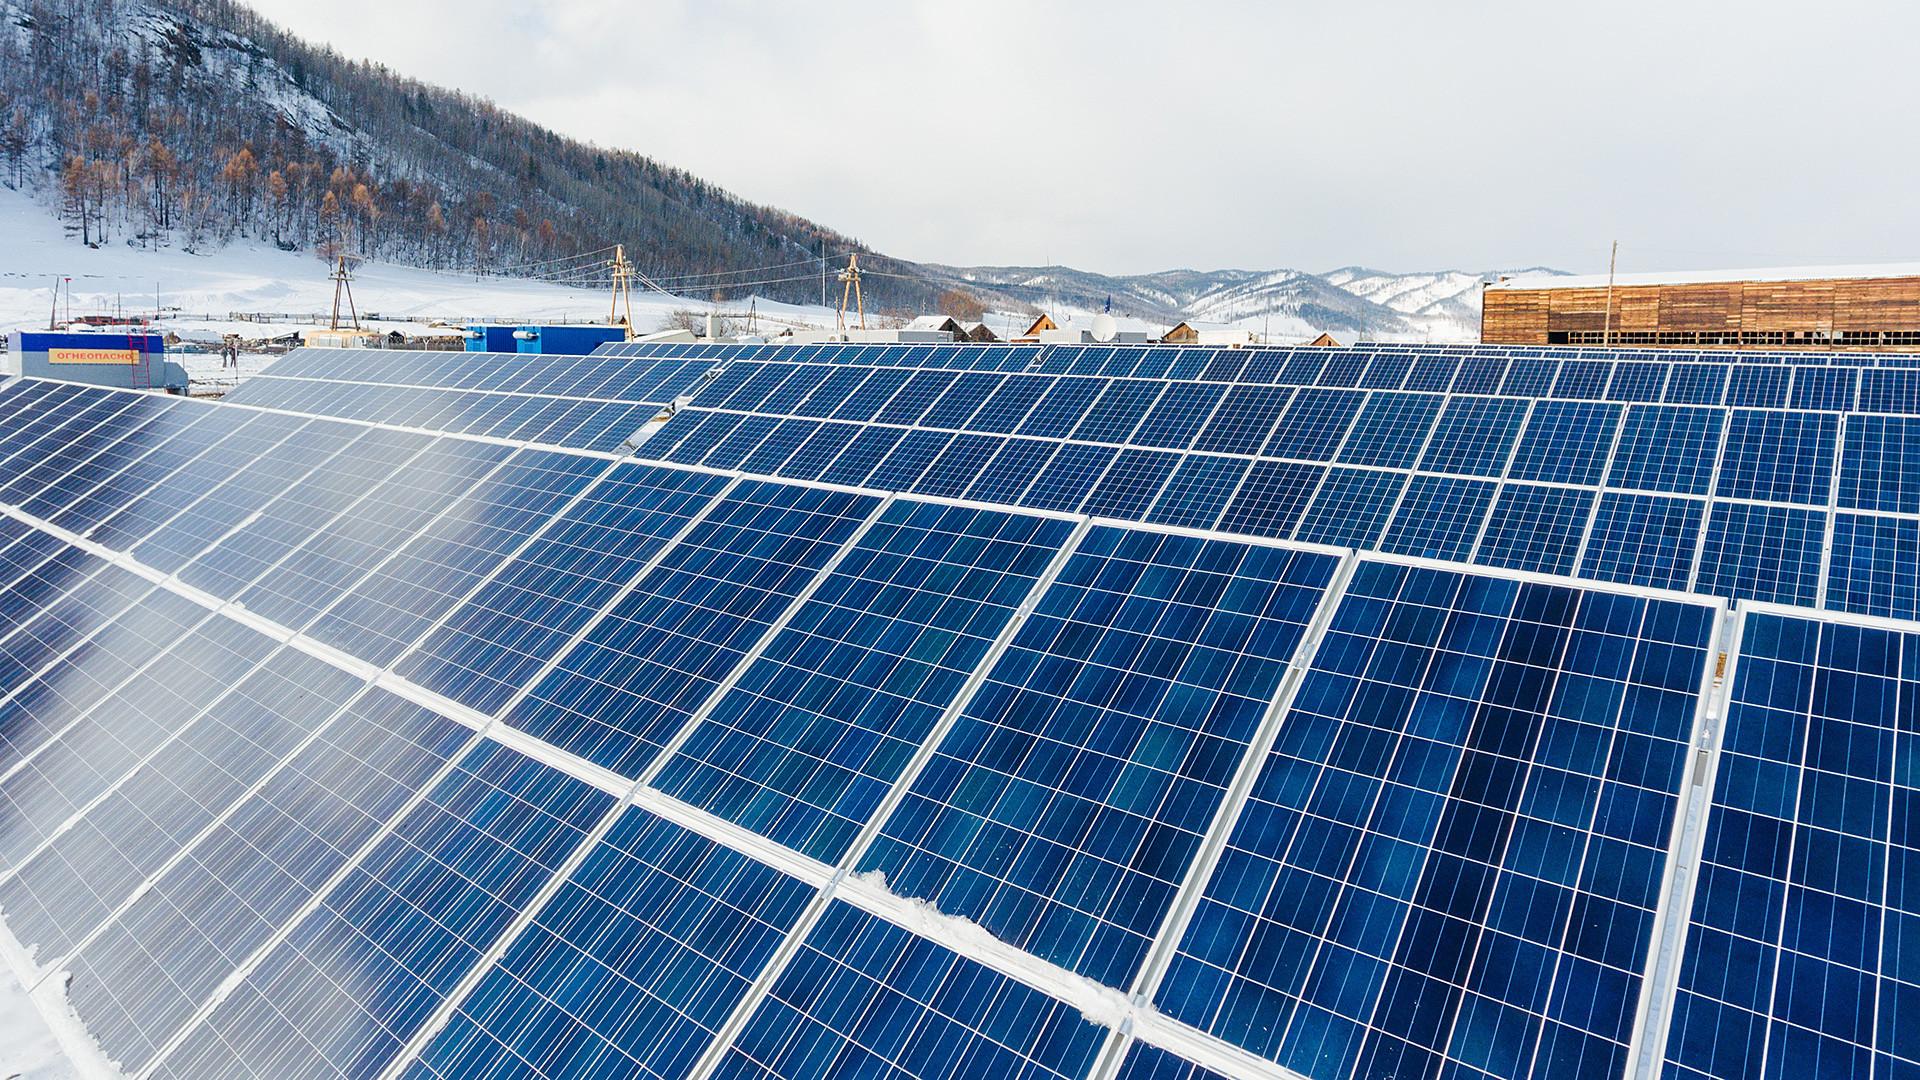 Solaranlage in der Mensa, Transbaikalien